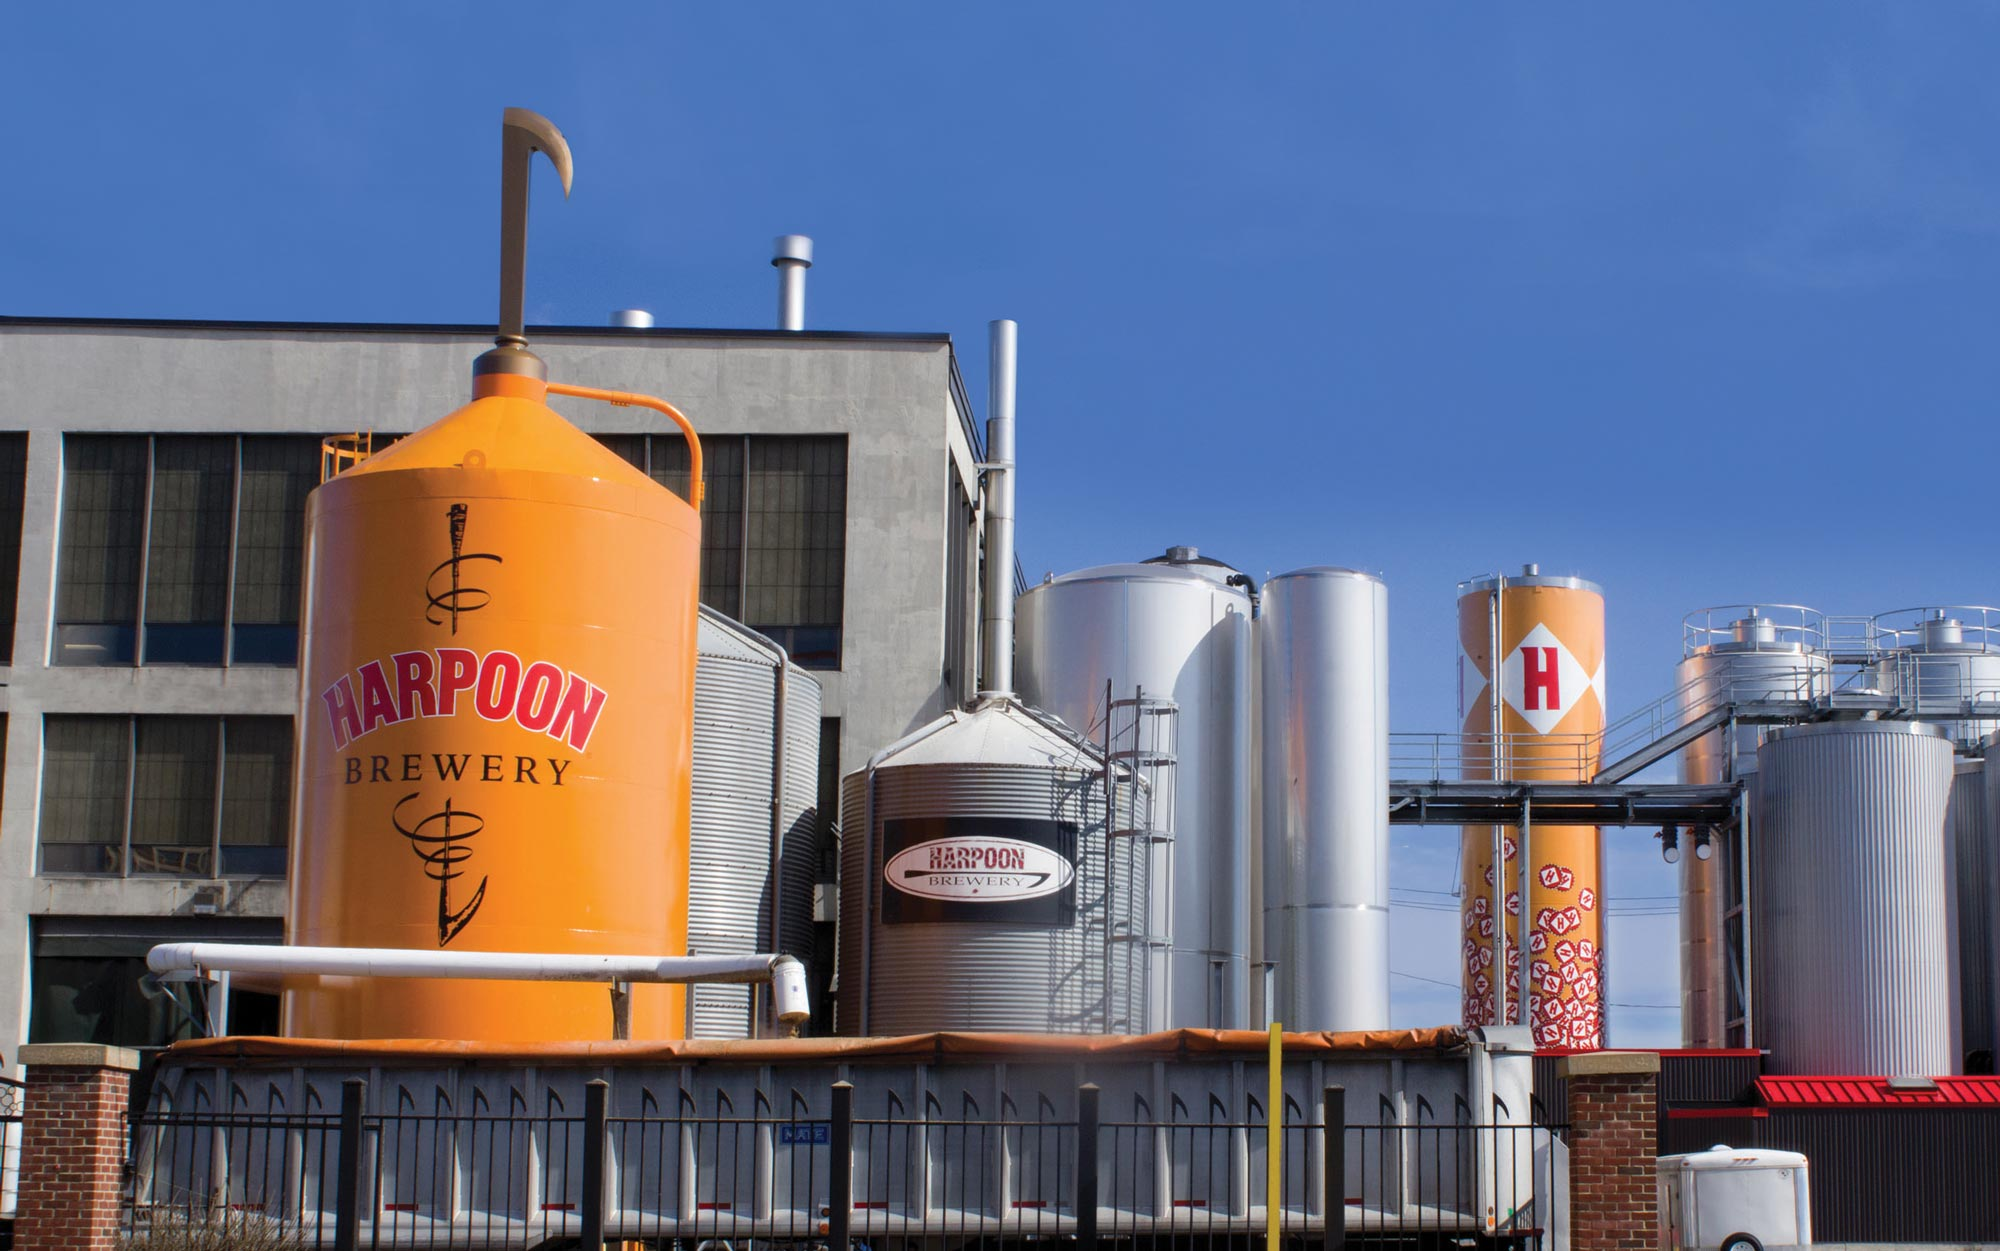 Harpoon IPA MA New beer coaster Harpoon Brewing Company Boston